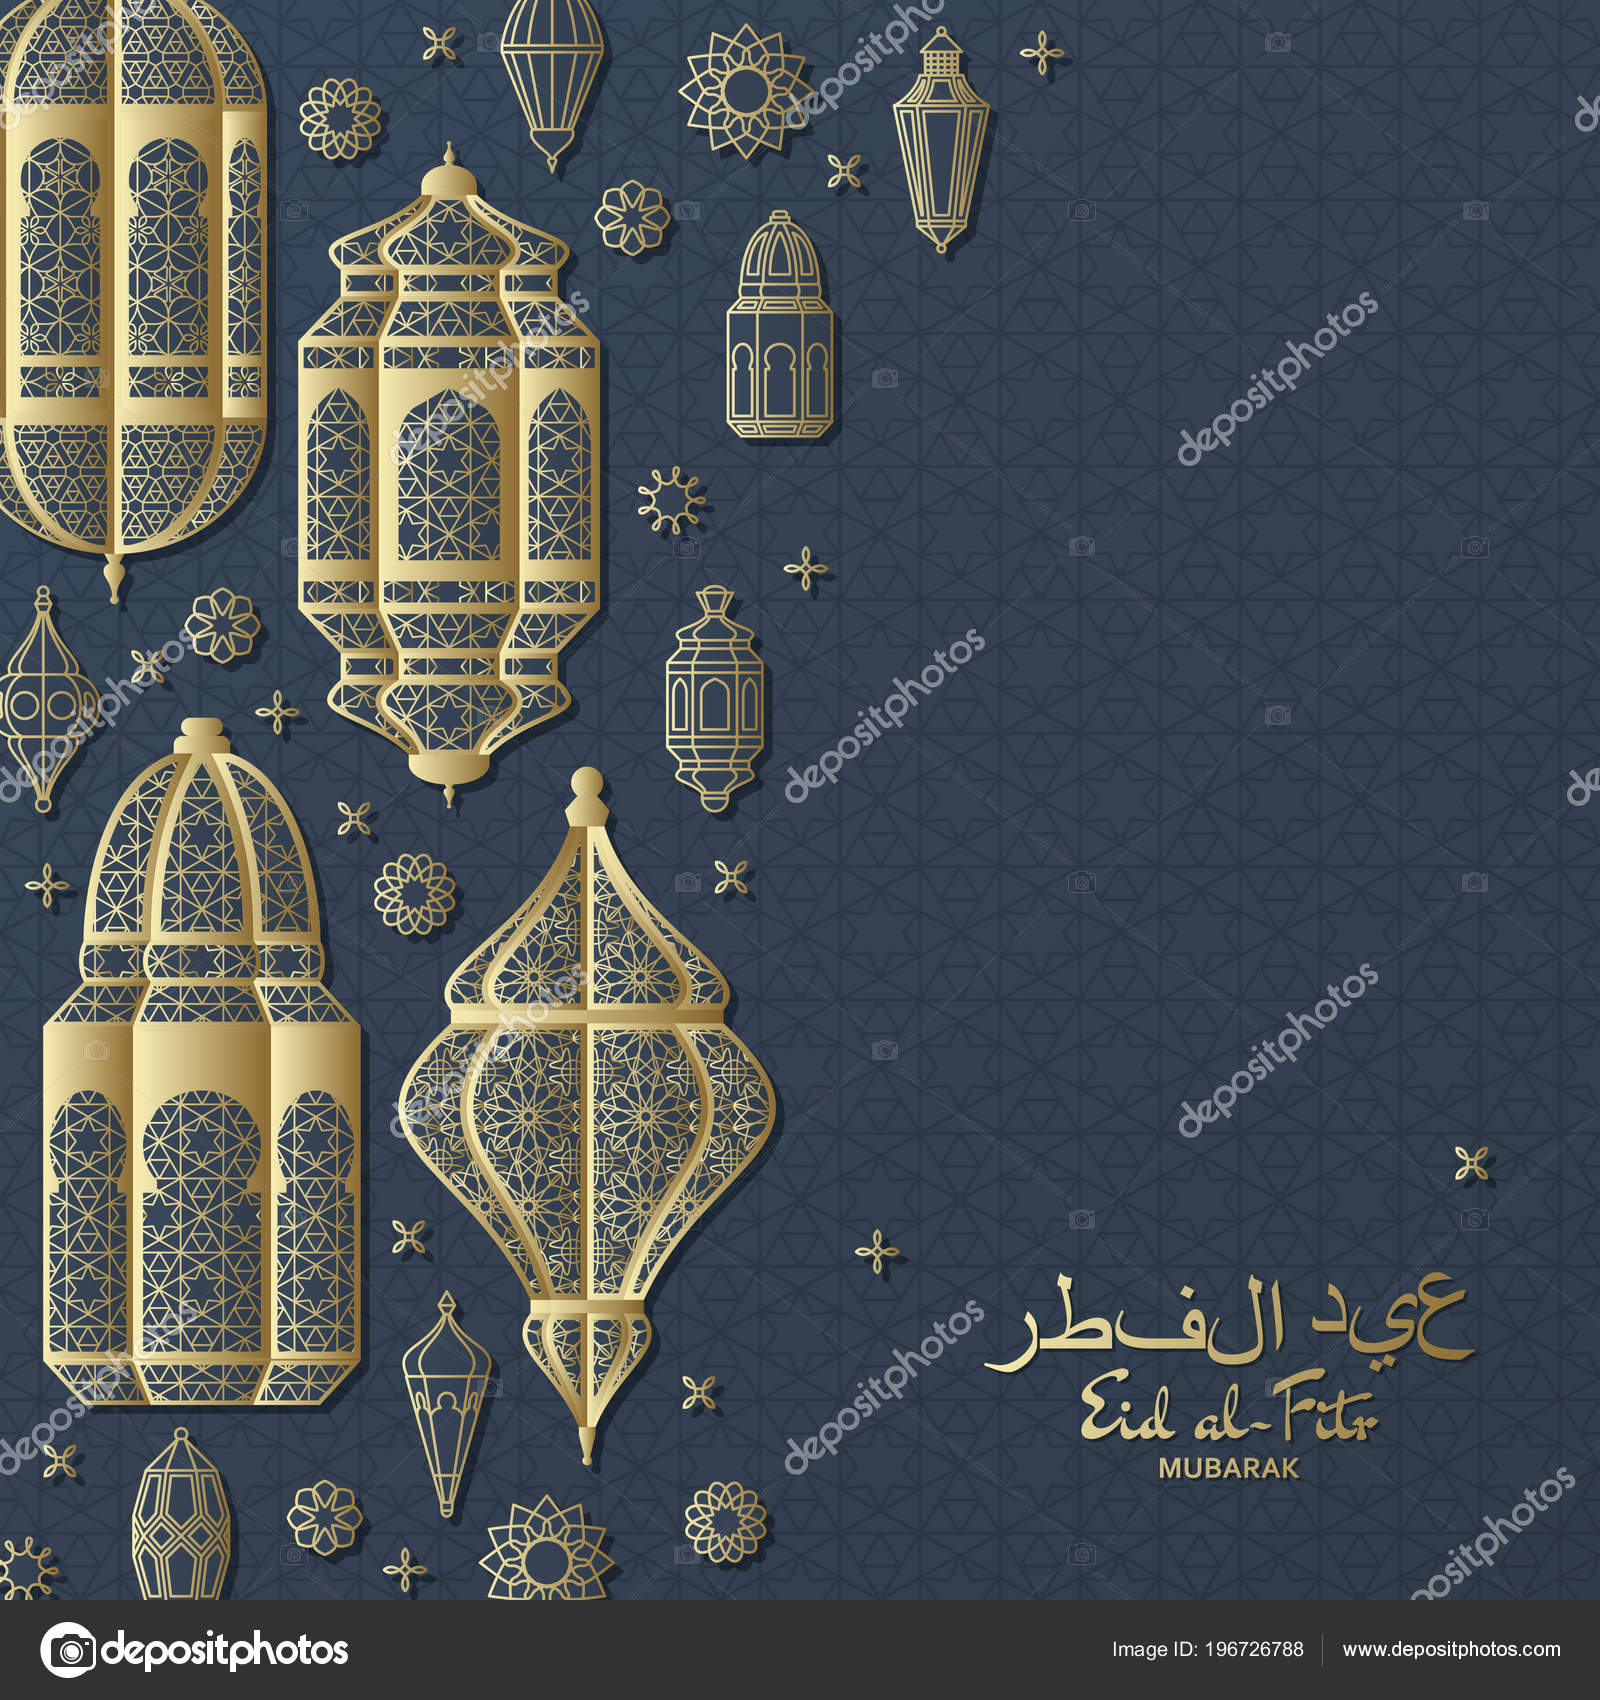 Best Hijri Eid Al-Fitr Greeting - depositphotos_196726788-stock-illustration-eid-al-fitr-background-islamic  Trends_642965 .jpg